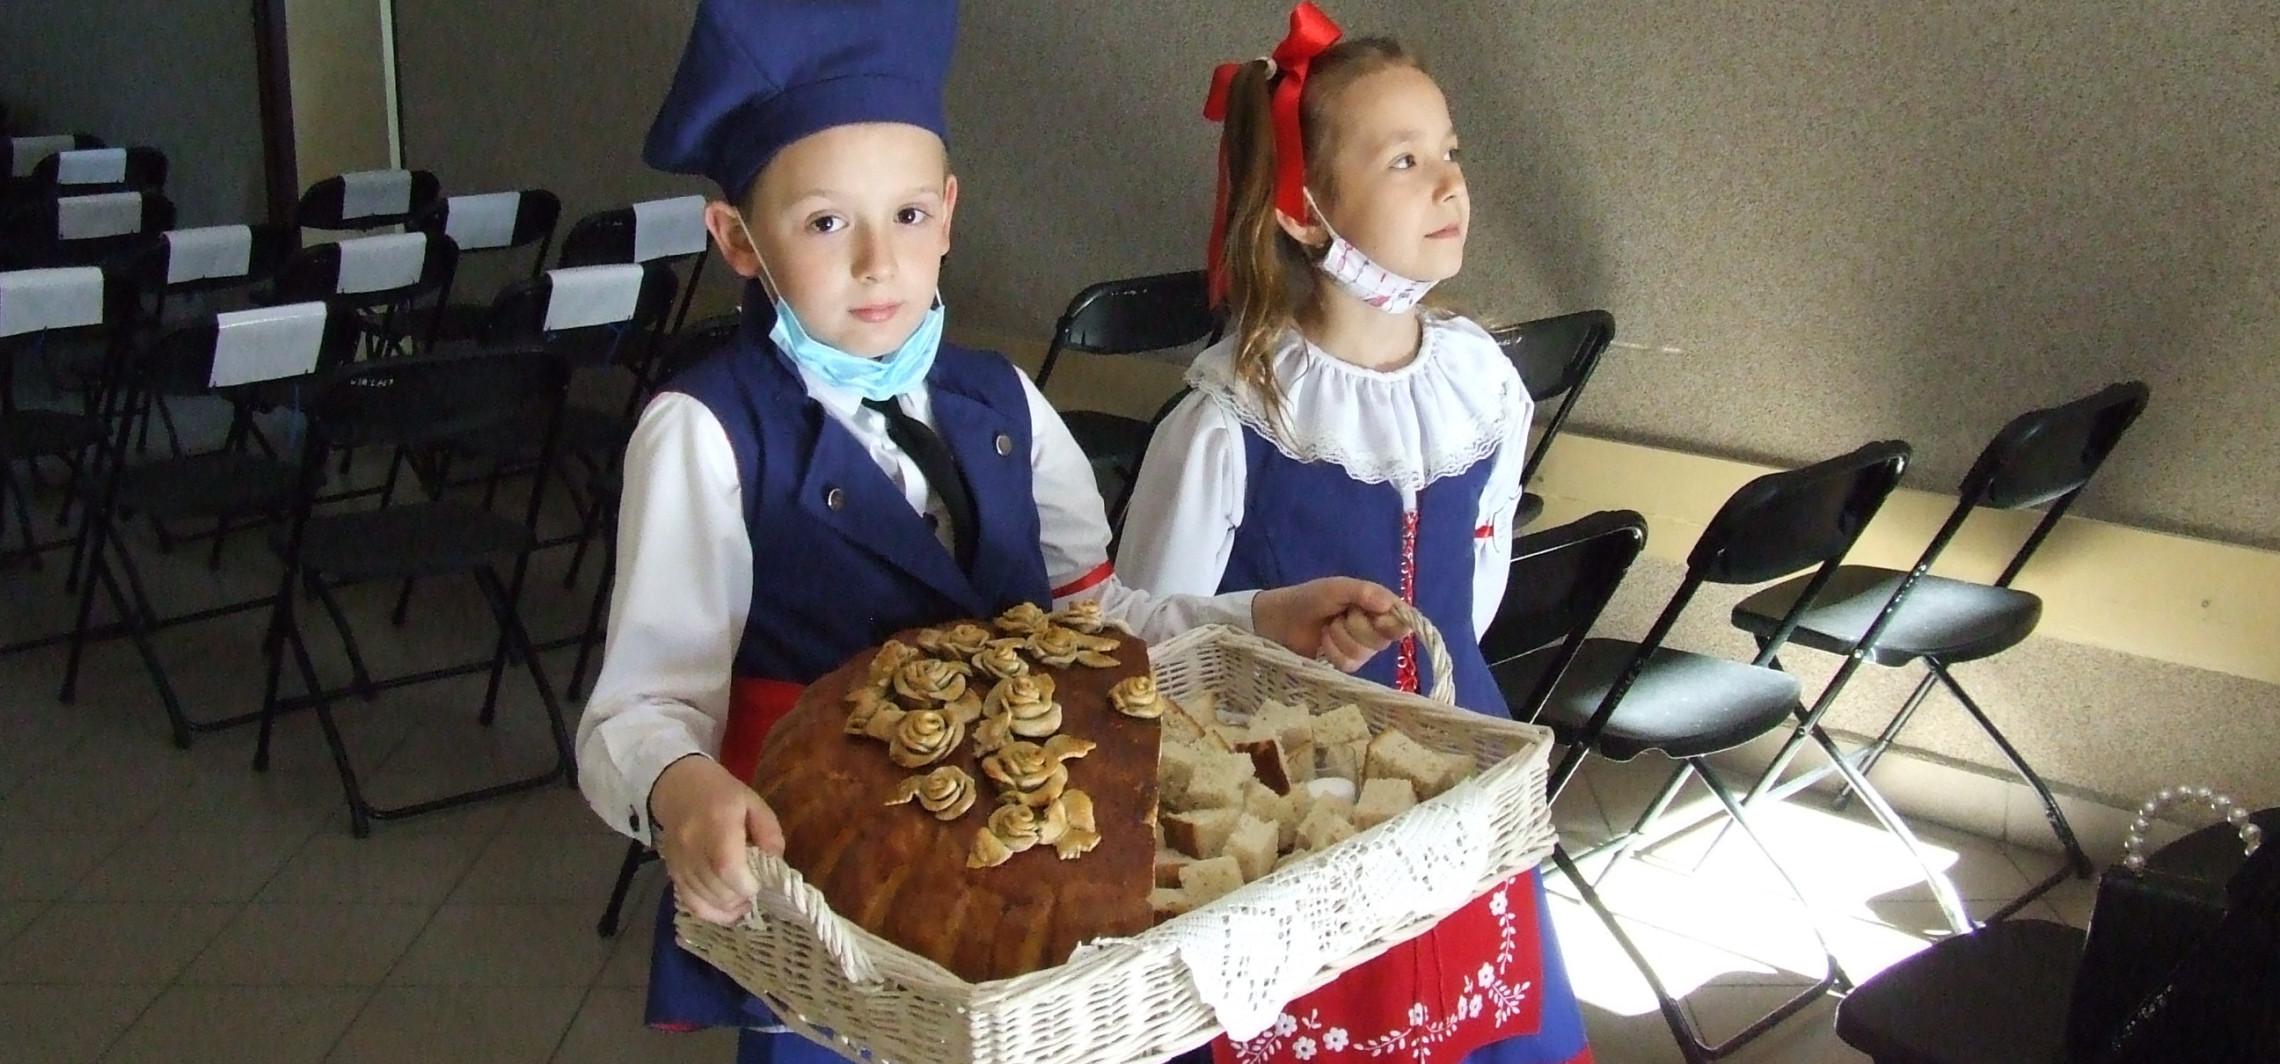 Gmina Inowrocław - Ta szkoła ma już 120 lat